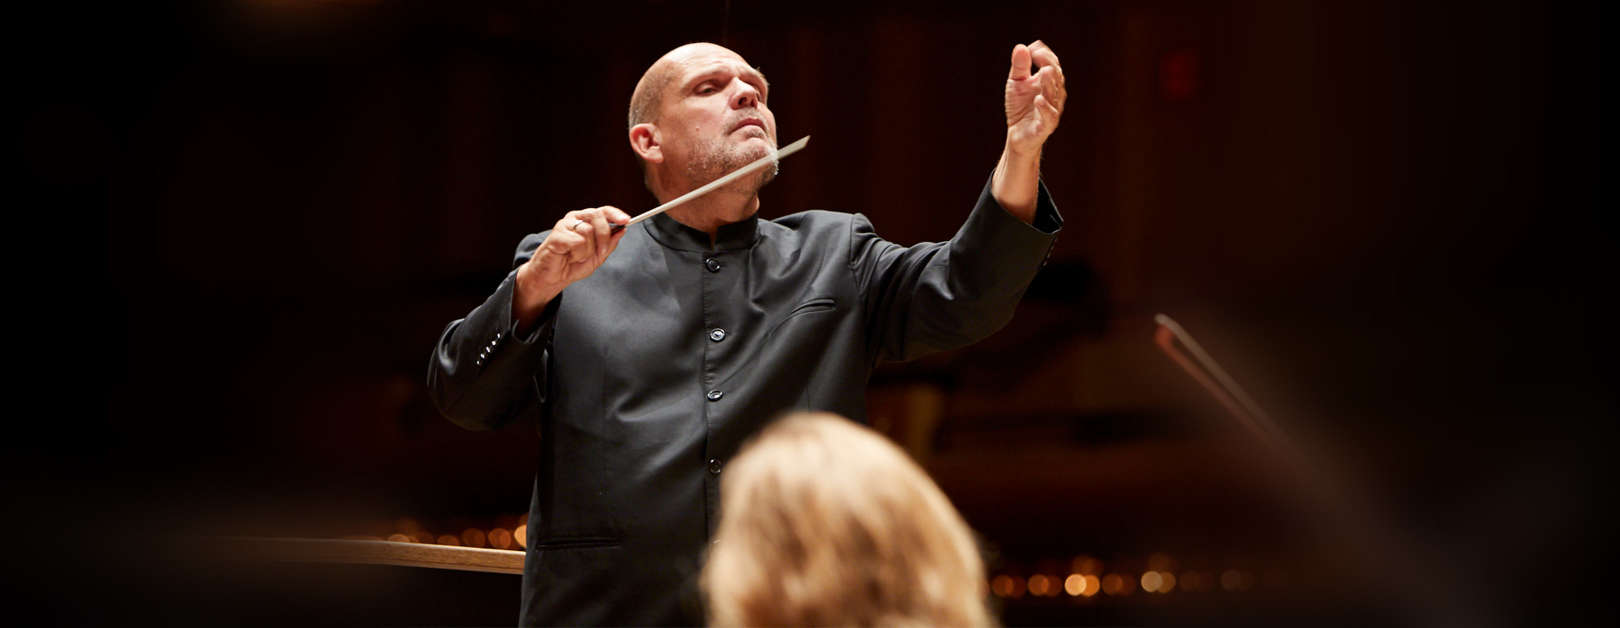 Jaap van Zweden Conducts Symphonie fantastique